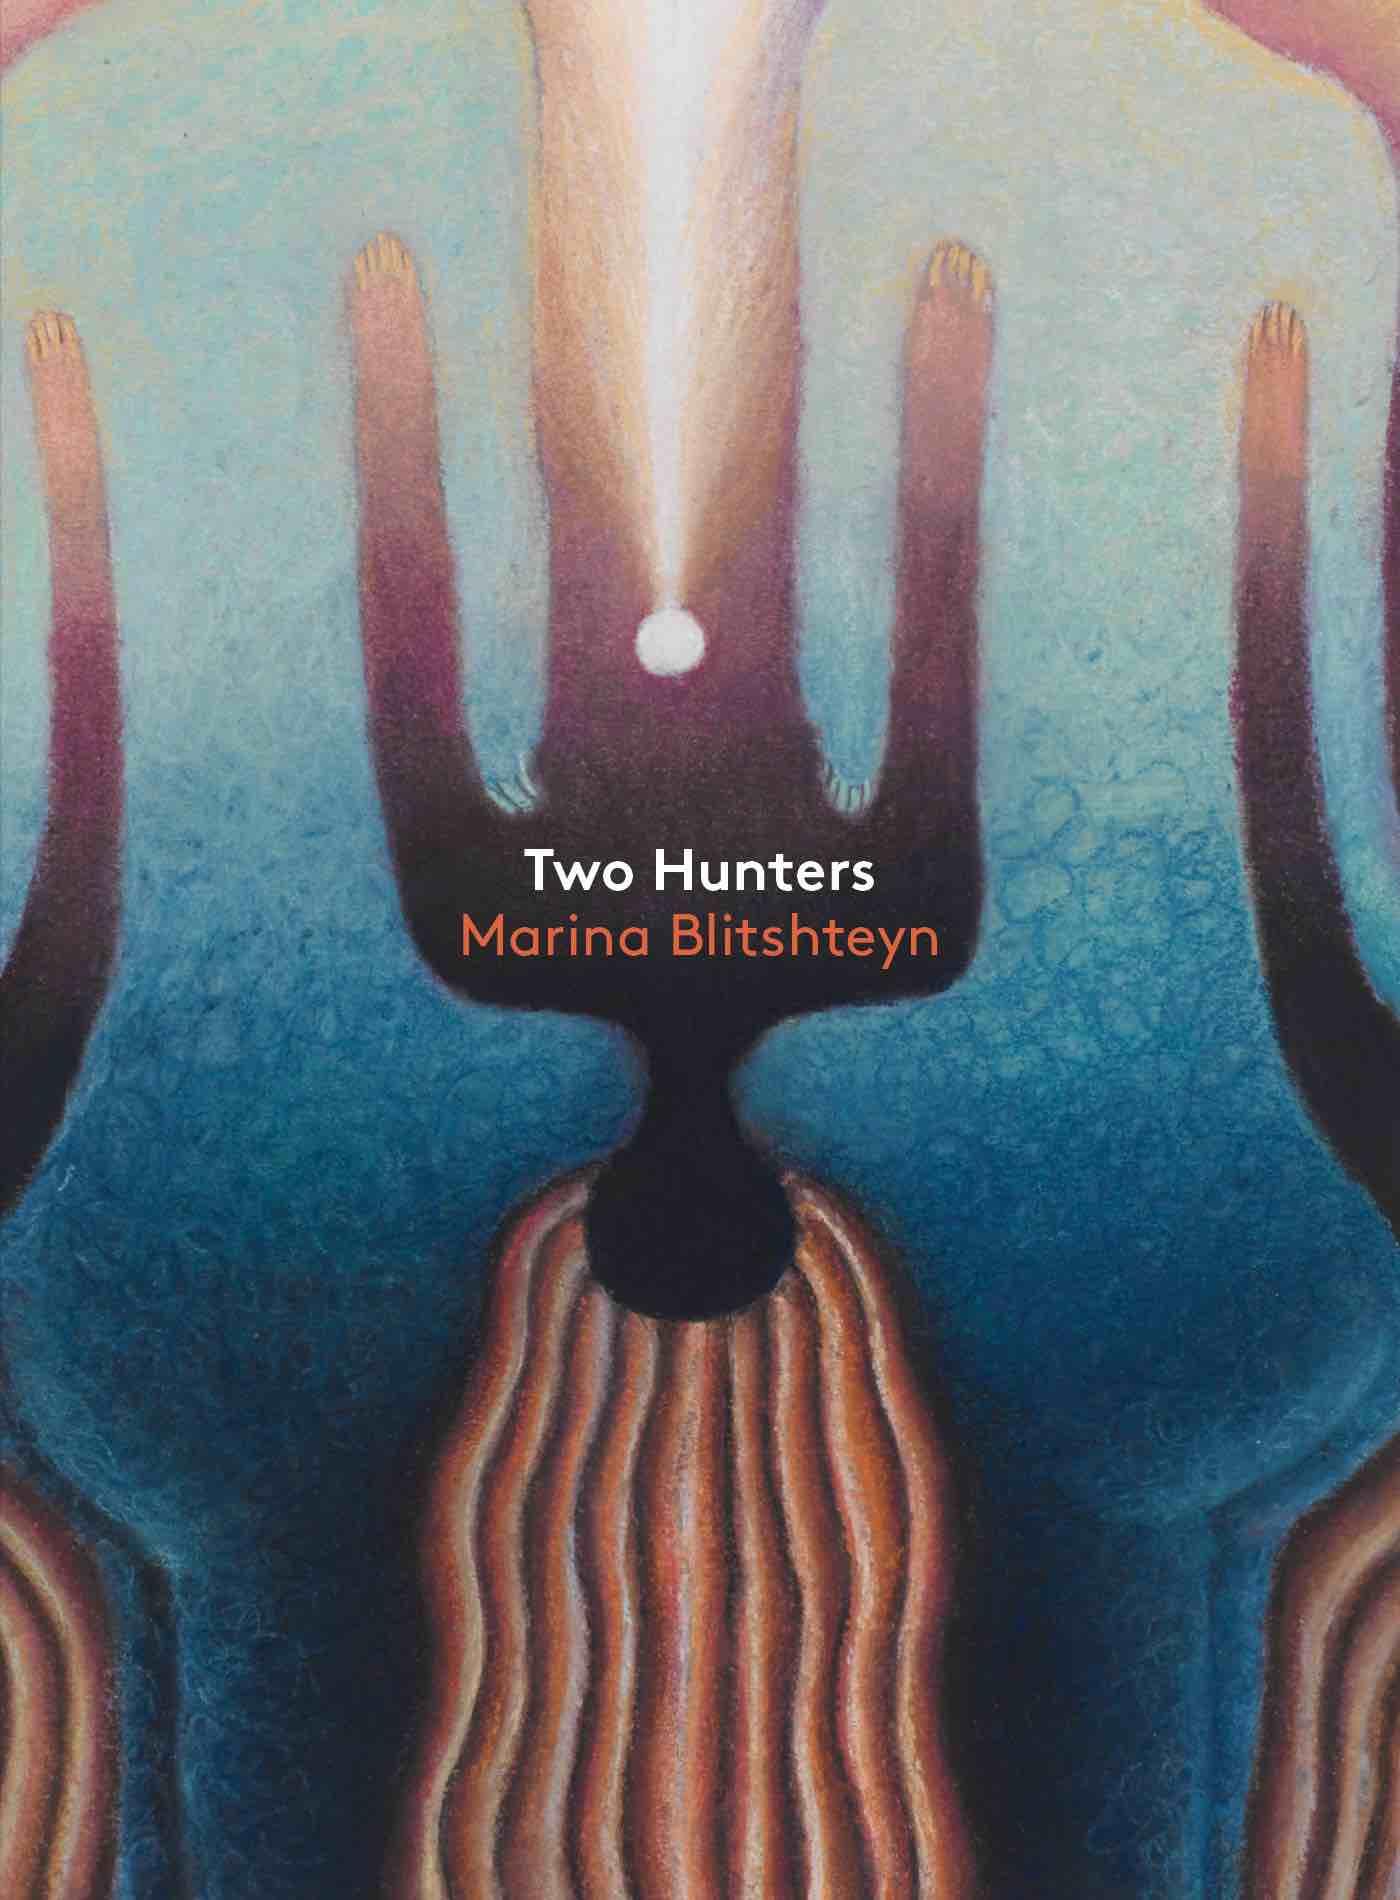 Poetry Book Launch: Two Hunters by Marina Blitshteyn